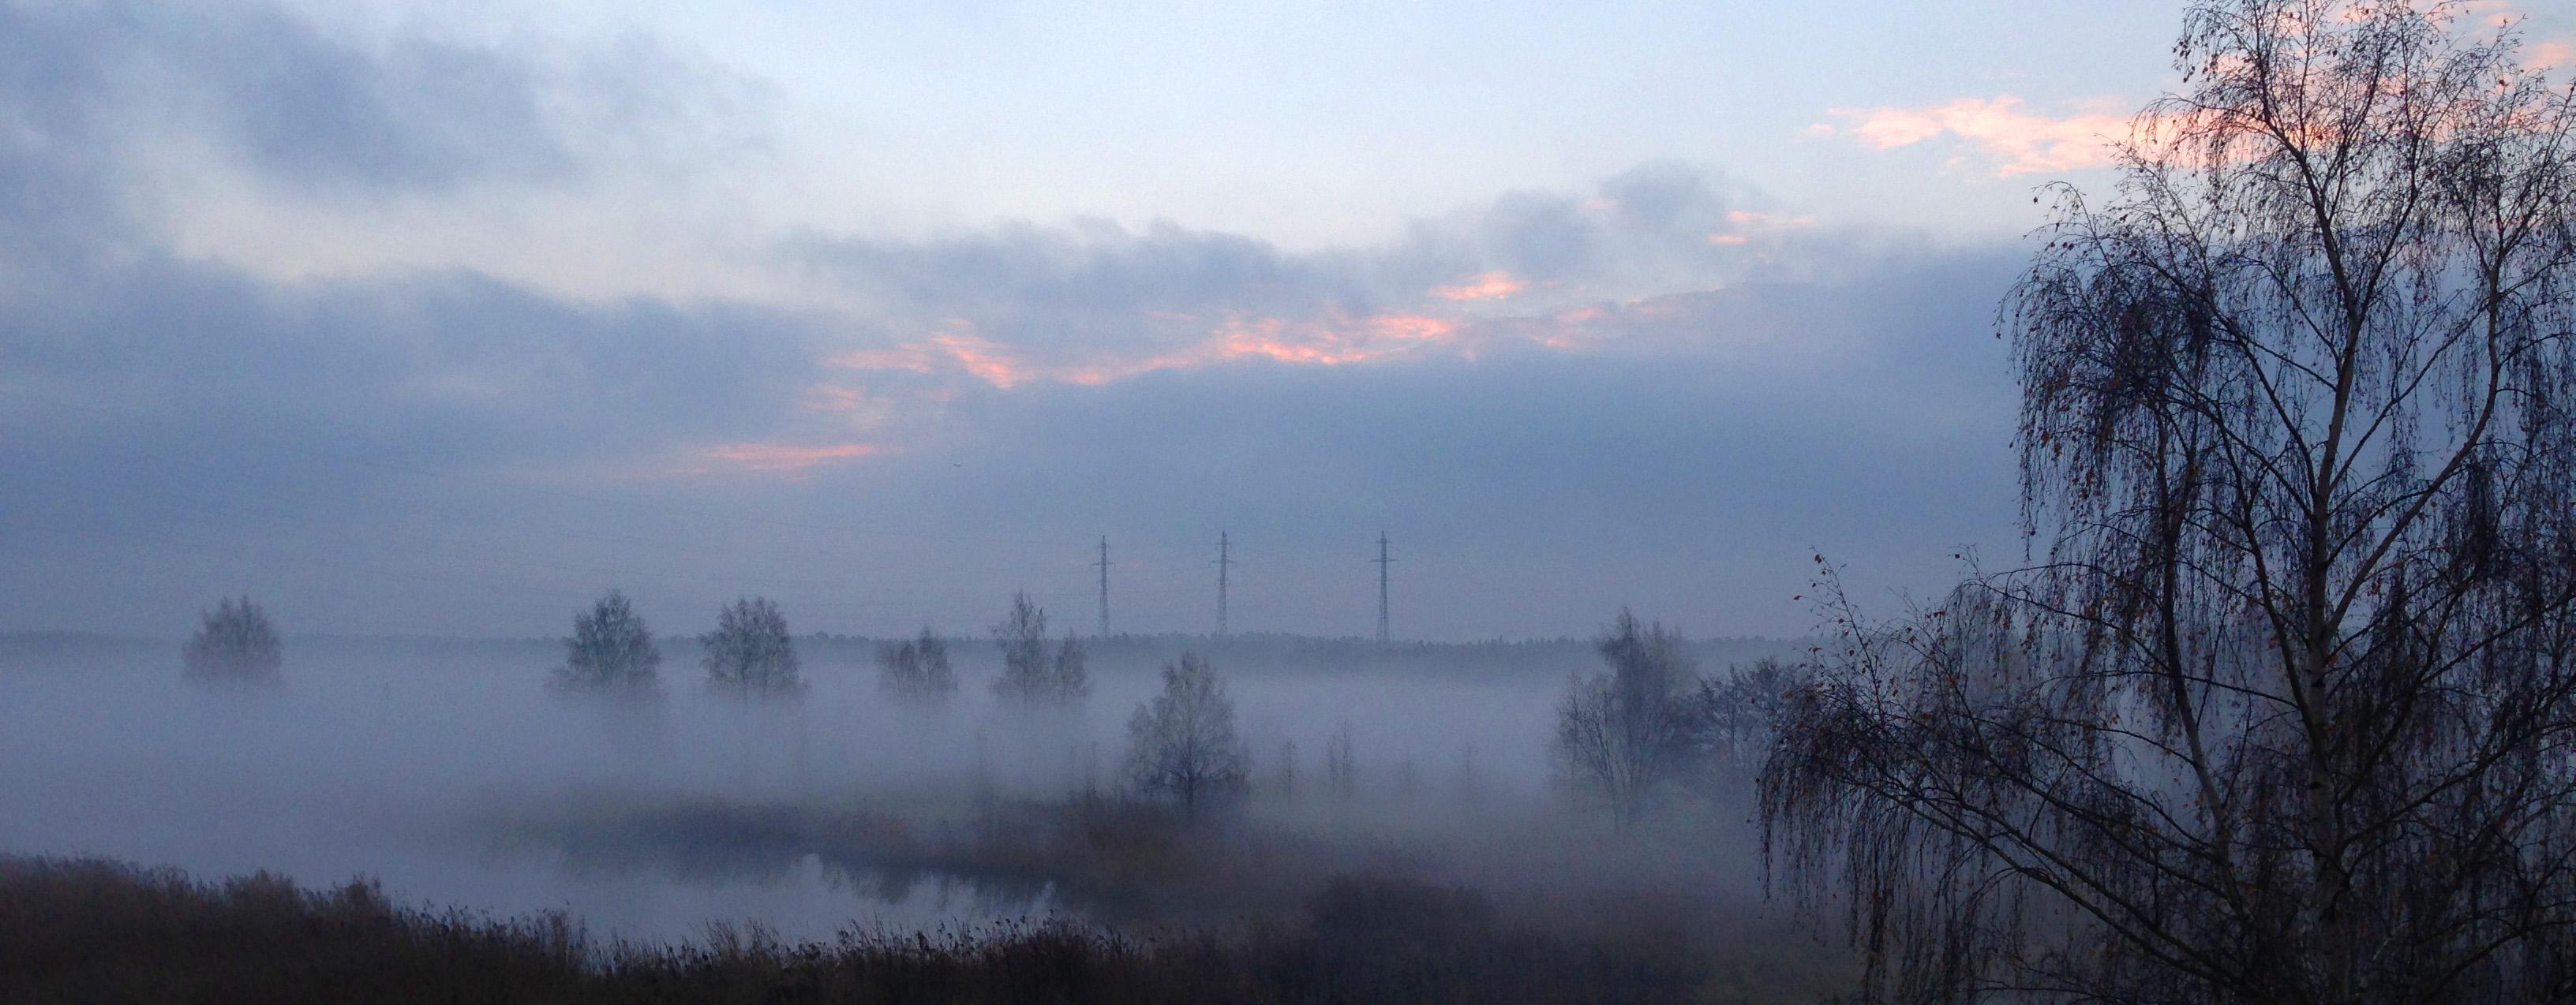 Июль туман на реке пейзажи природы Альберт Сафиуллин